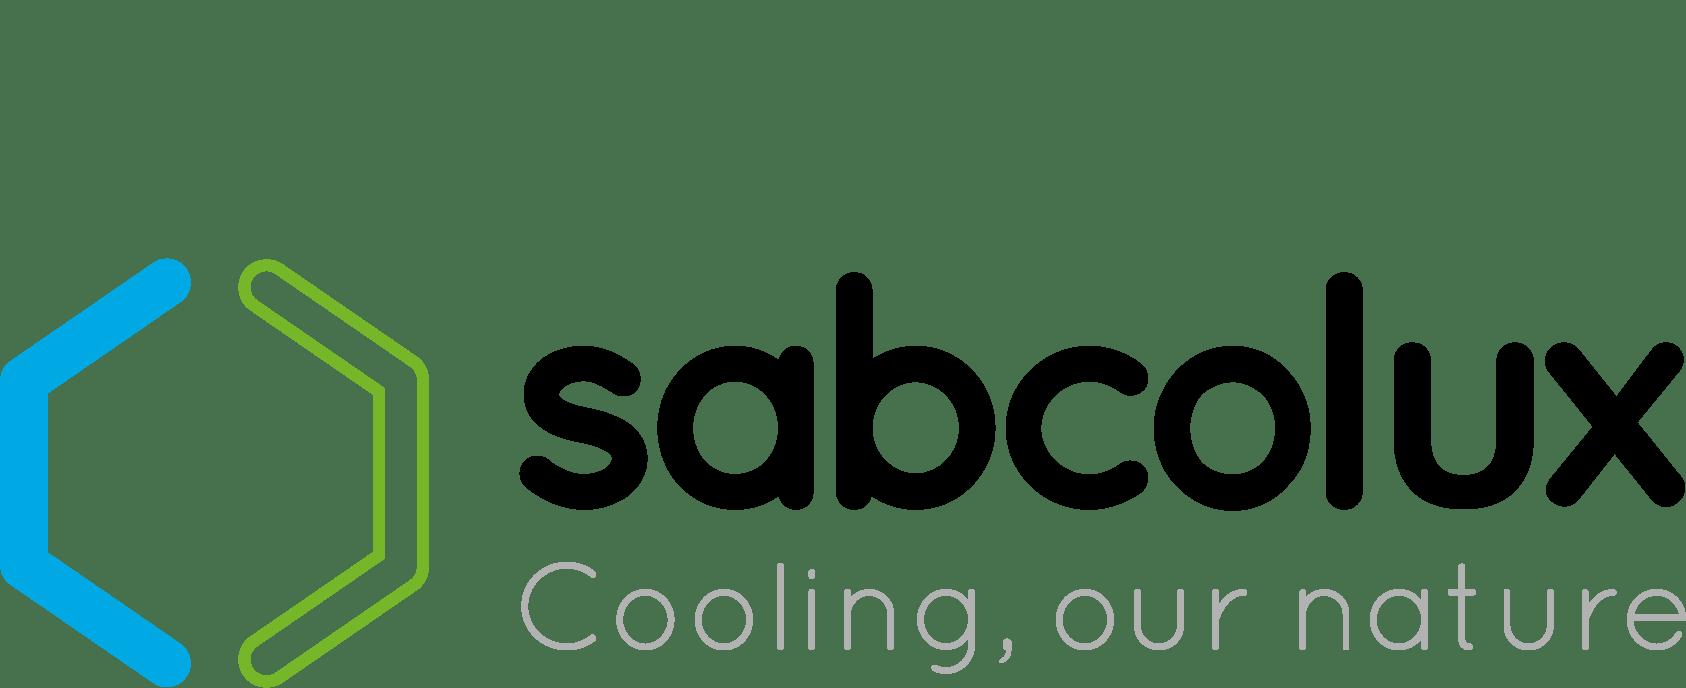 FREOR-PARTNERS-Sabcolux-Luxemburg-logo